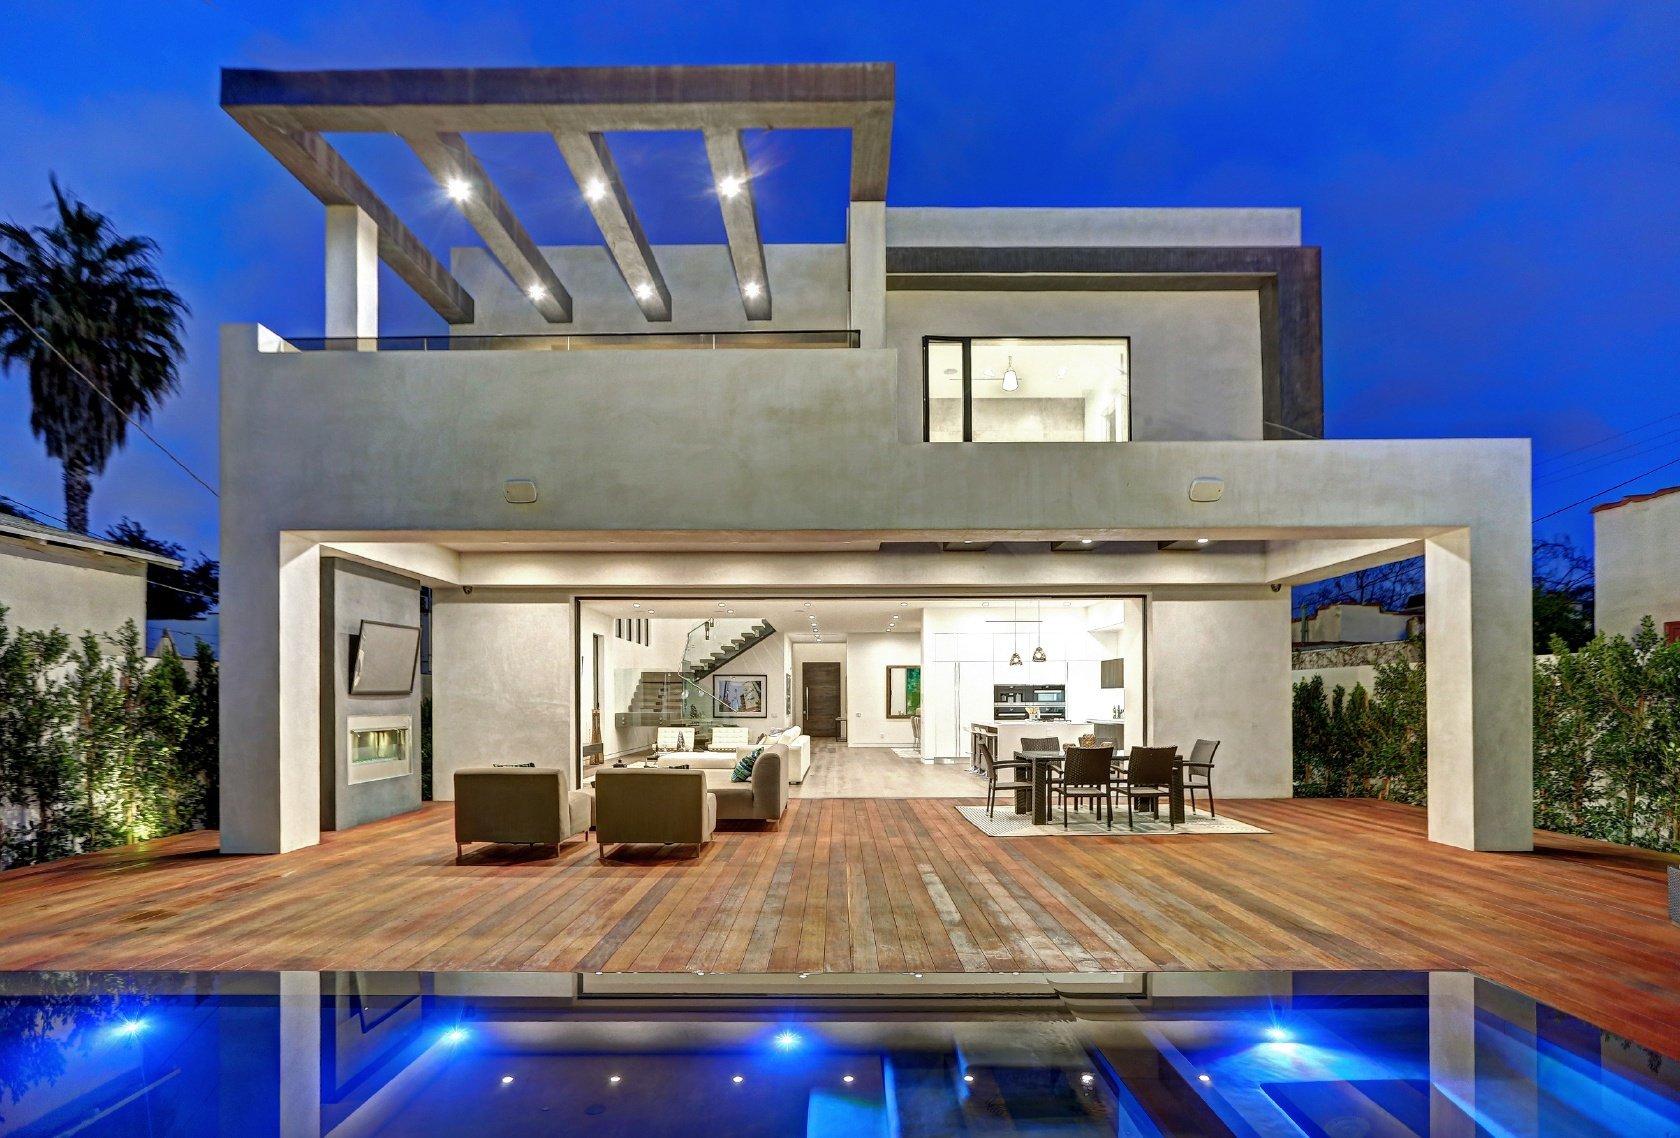 Strange Summerhill Homes For Sale In Ahwatukee Foothills Phoenix Az Interior Design Ideas Gentotryabchikinfo